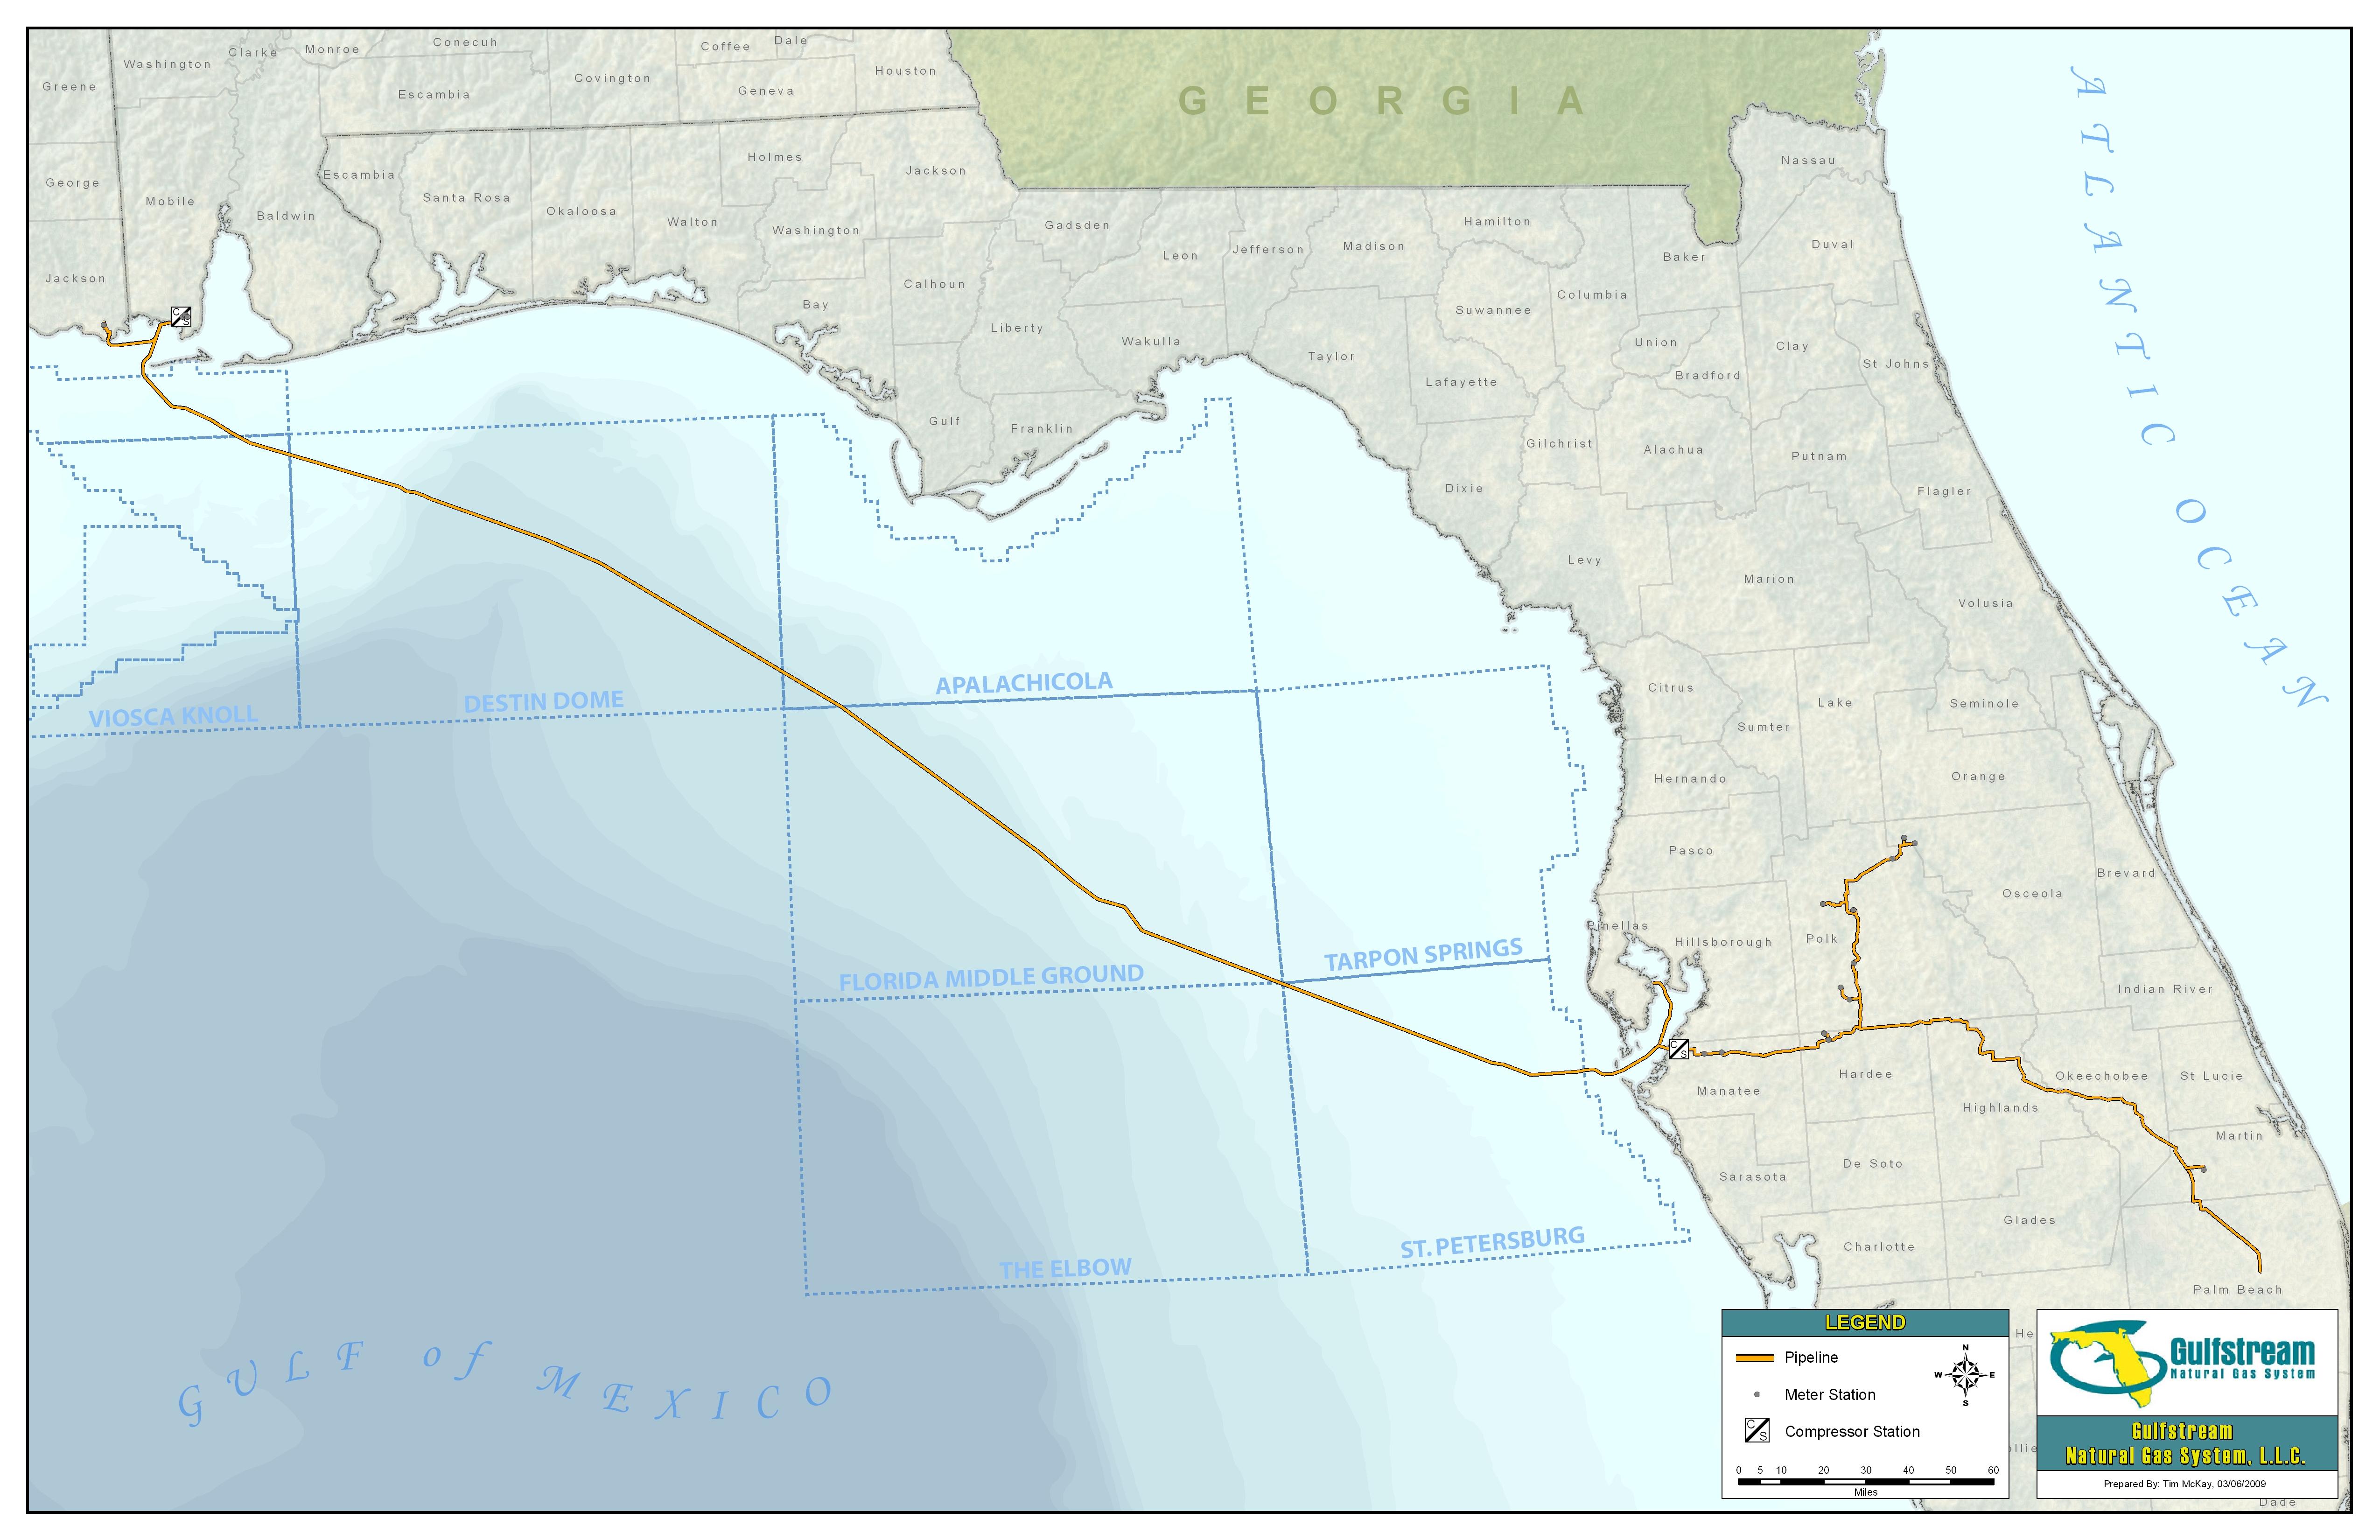 Gulfstream Natural Gas System